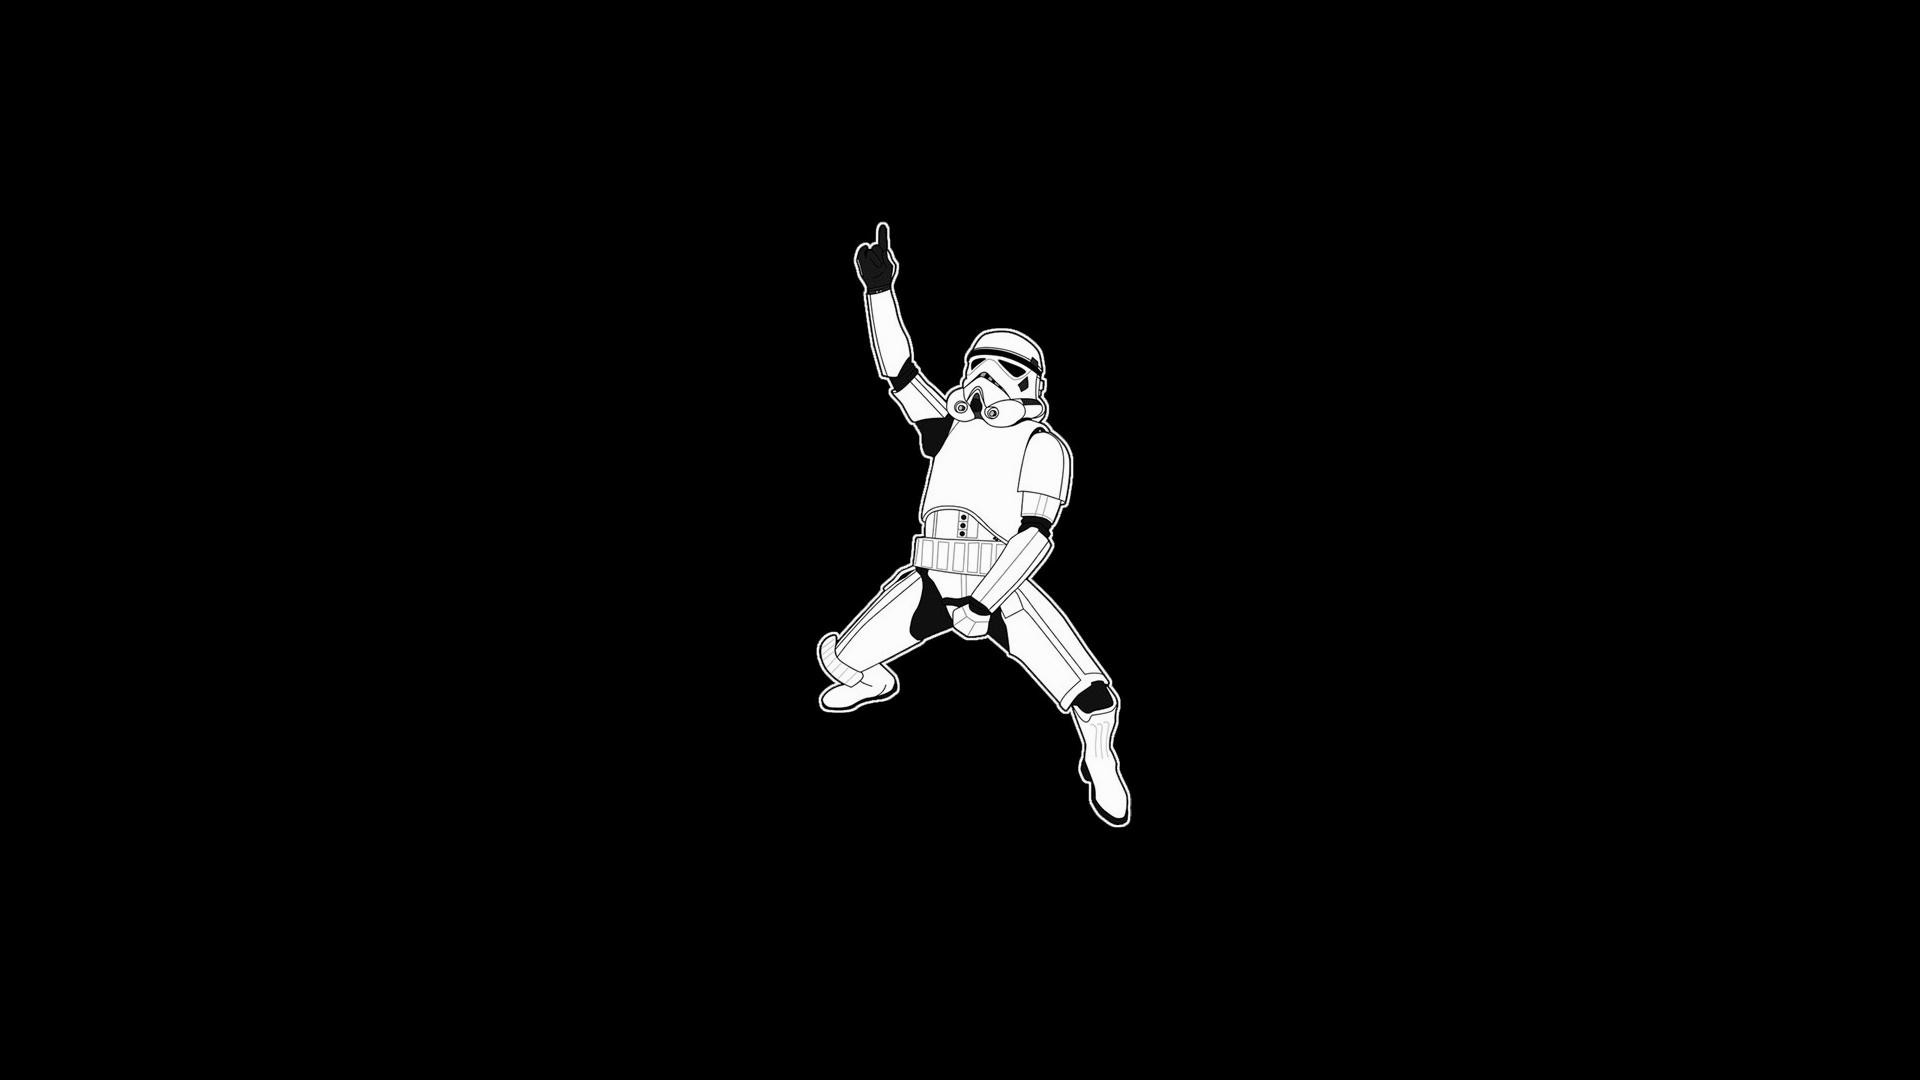 Stormtrooper Wallpaper 1080p 72+ images